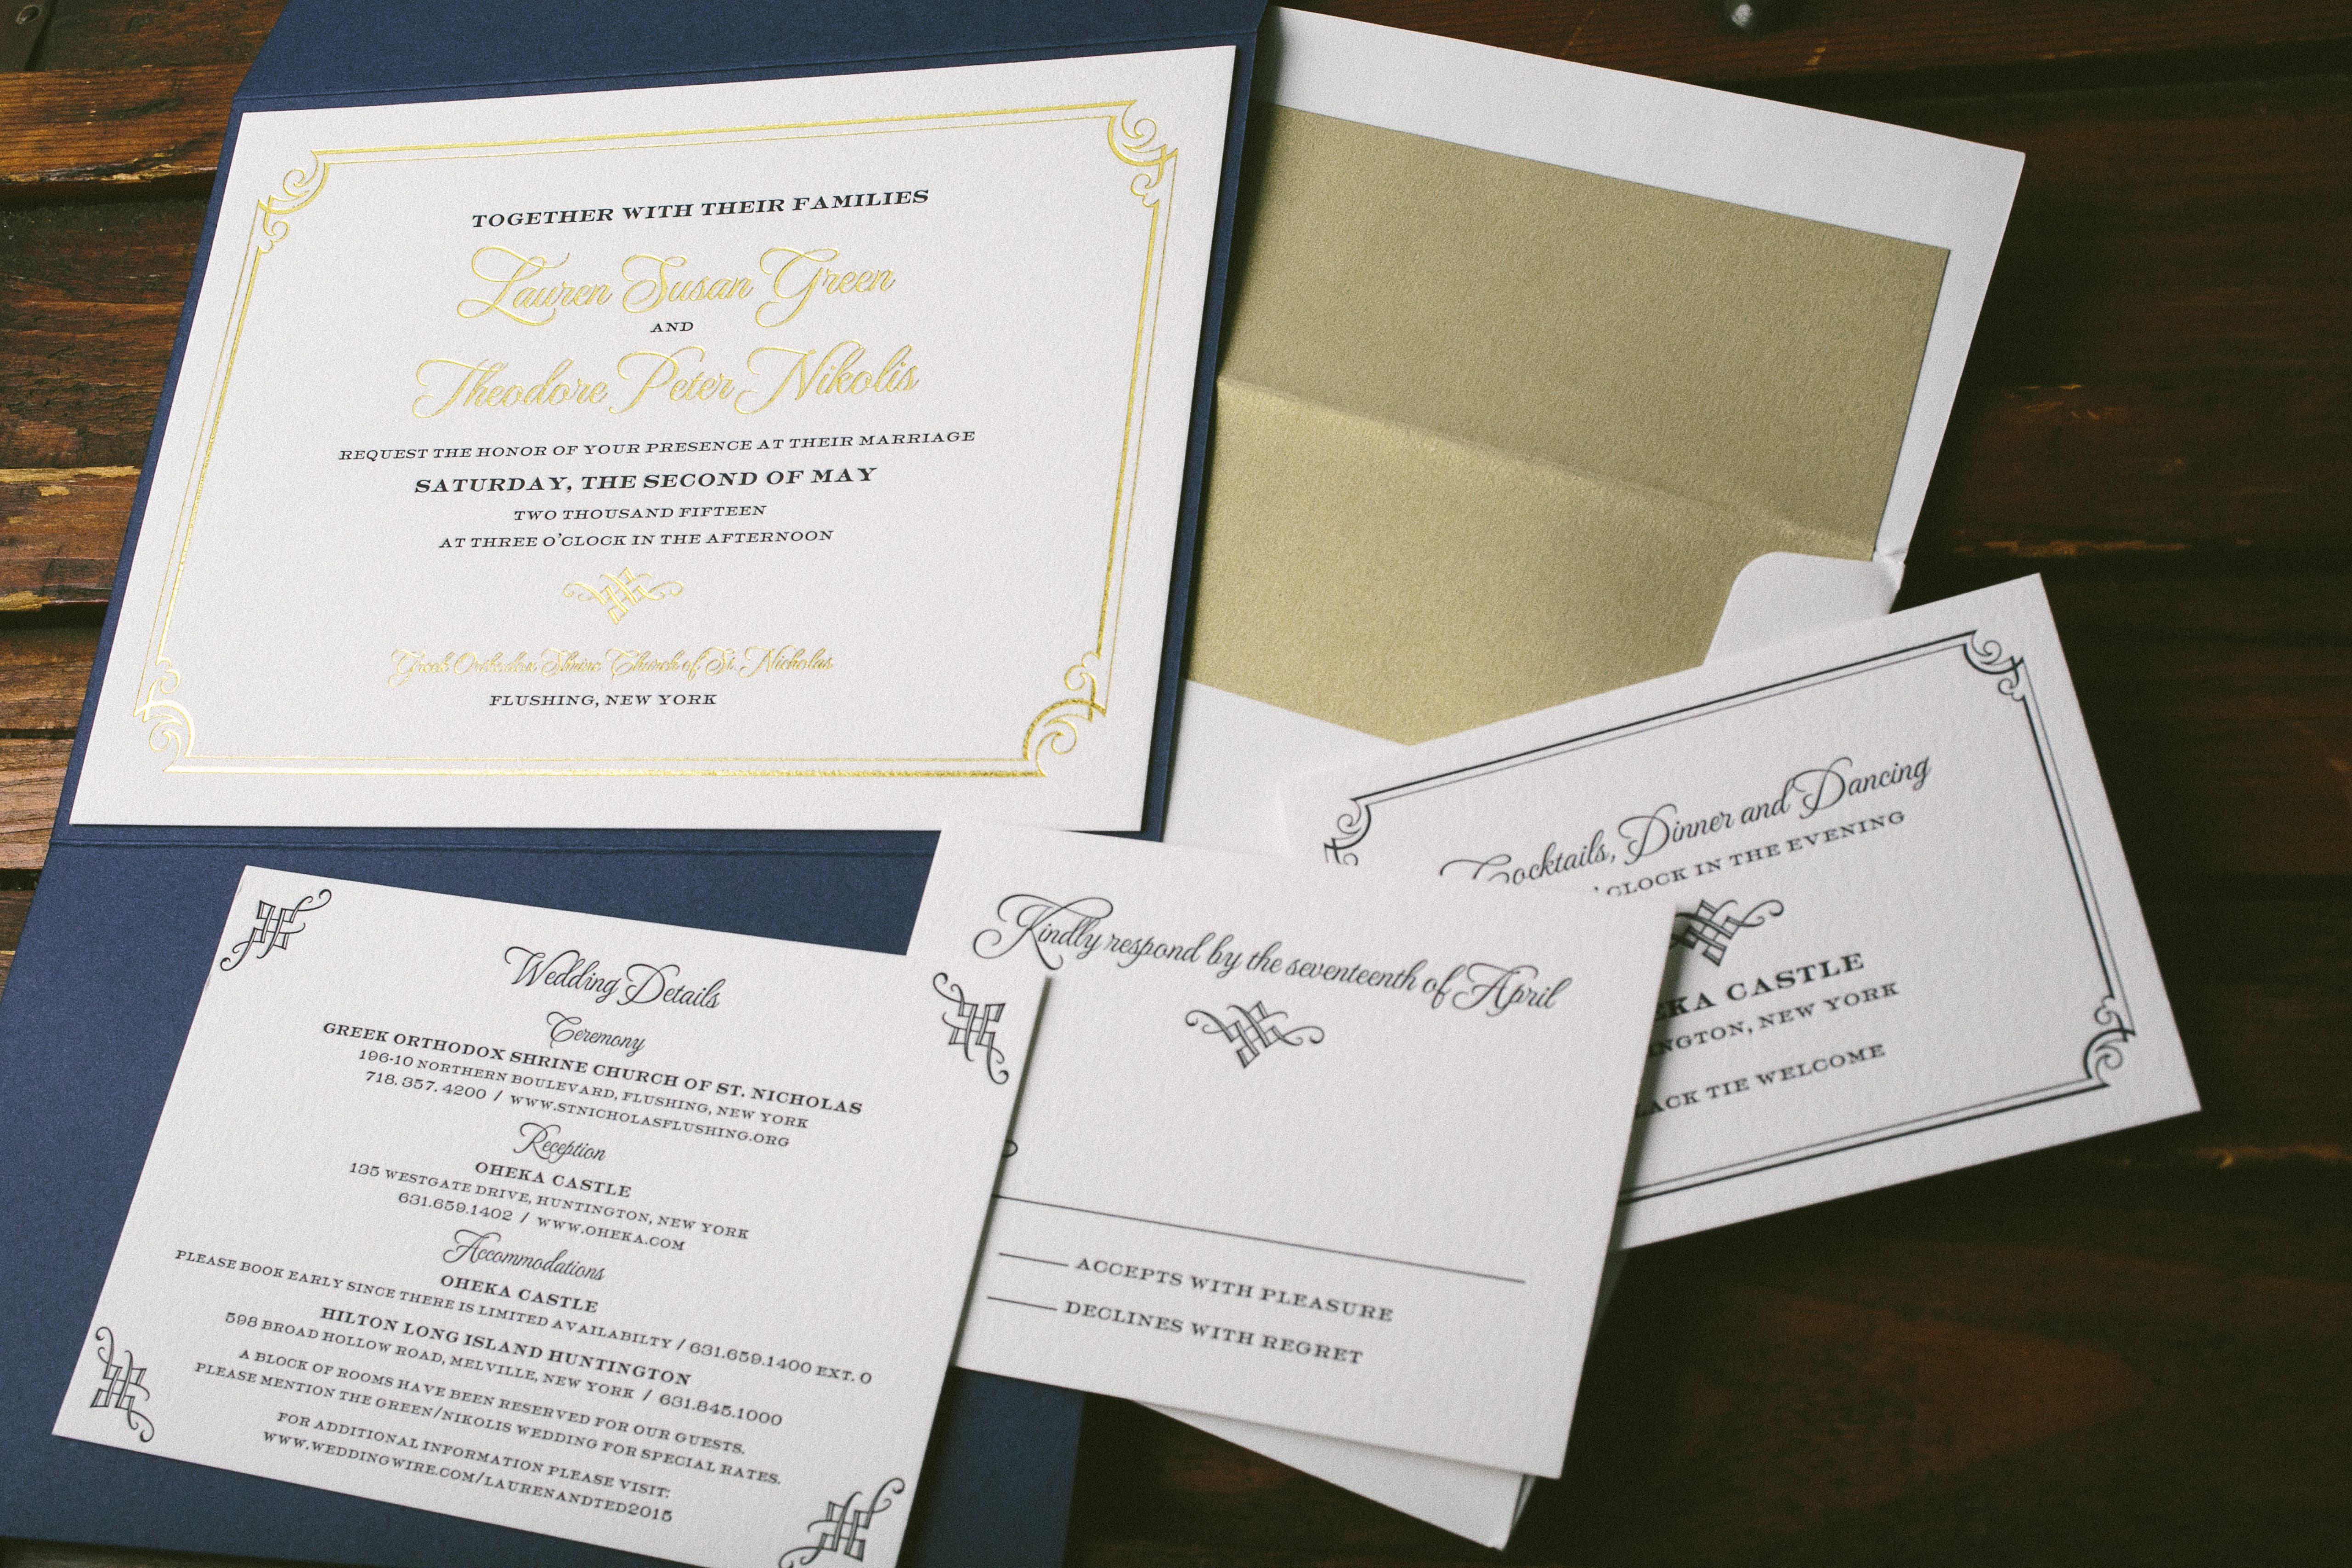 Formal frame wedding invitations for Oheka Castle wedding - Bella Figura